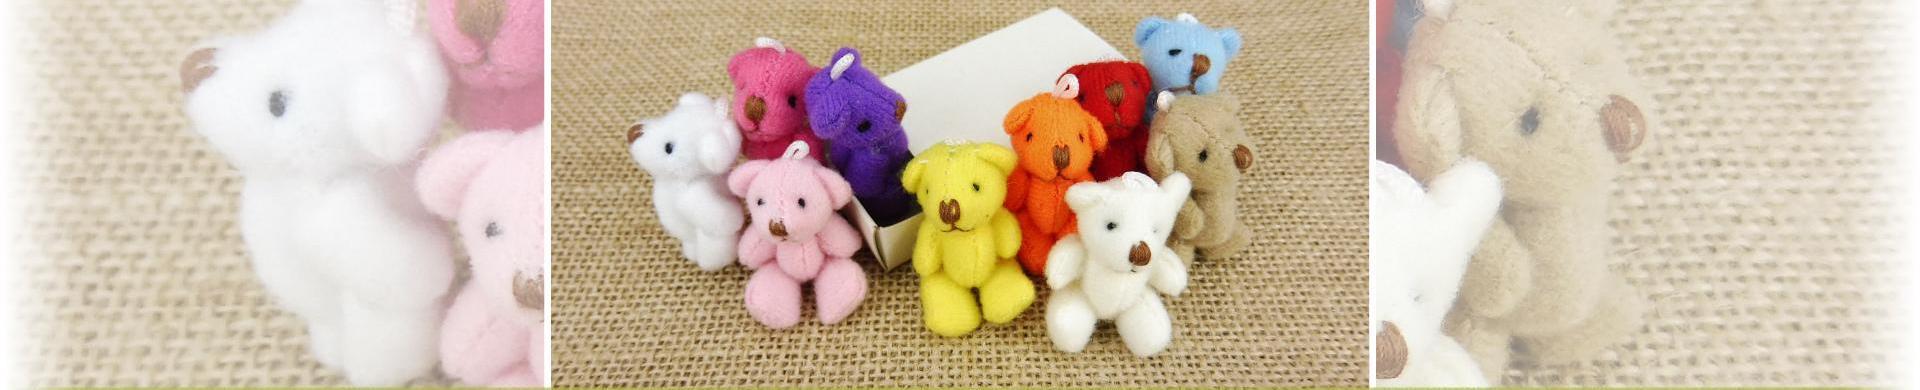 Teddy Bears & Rabbits